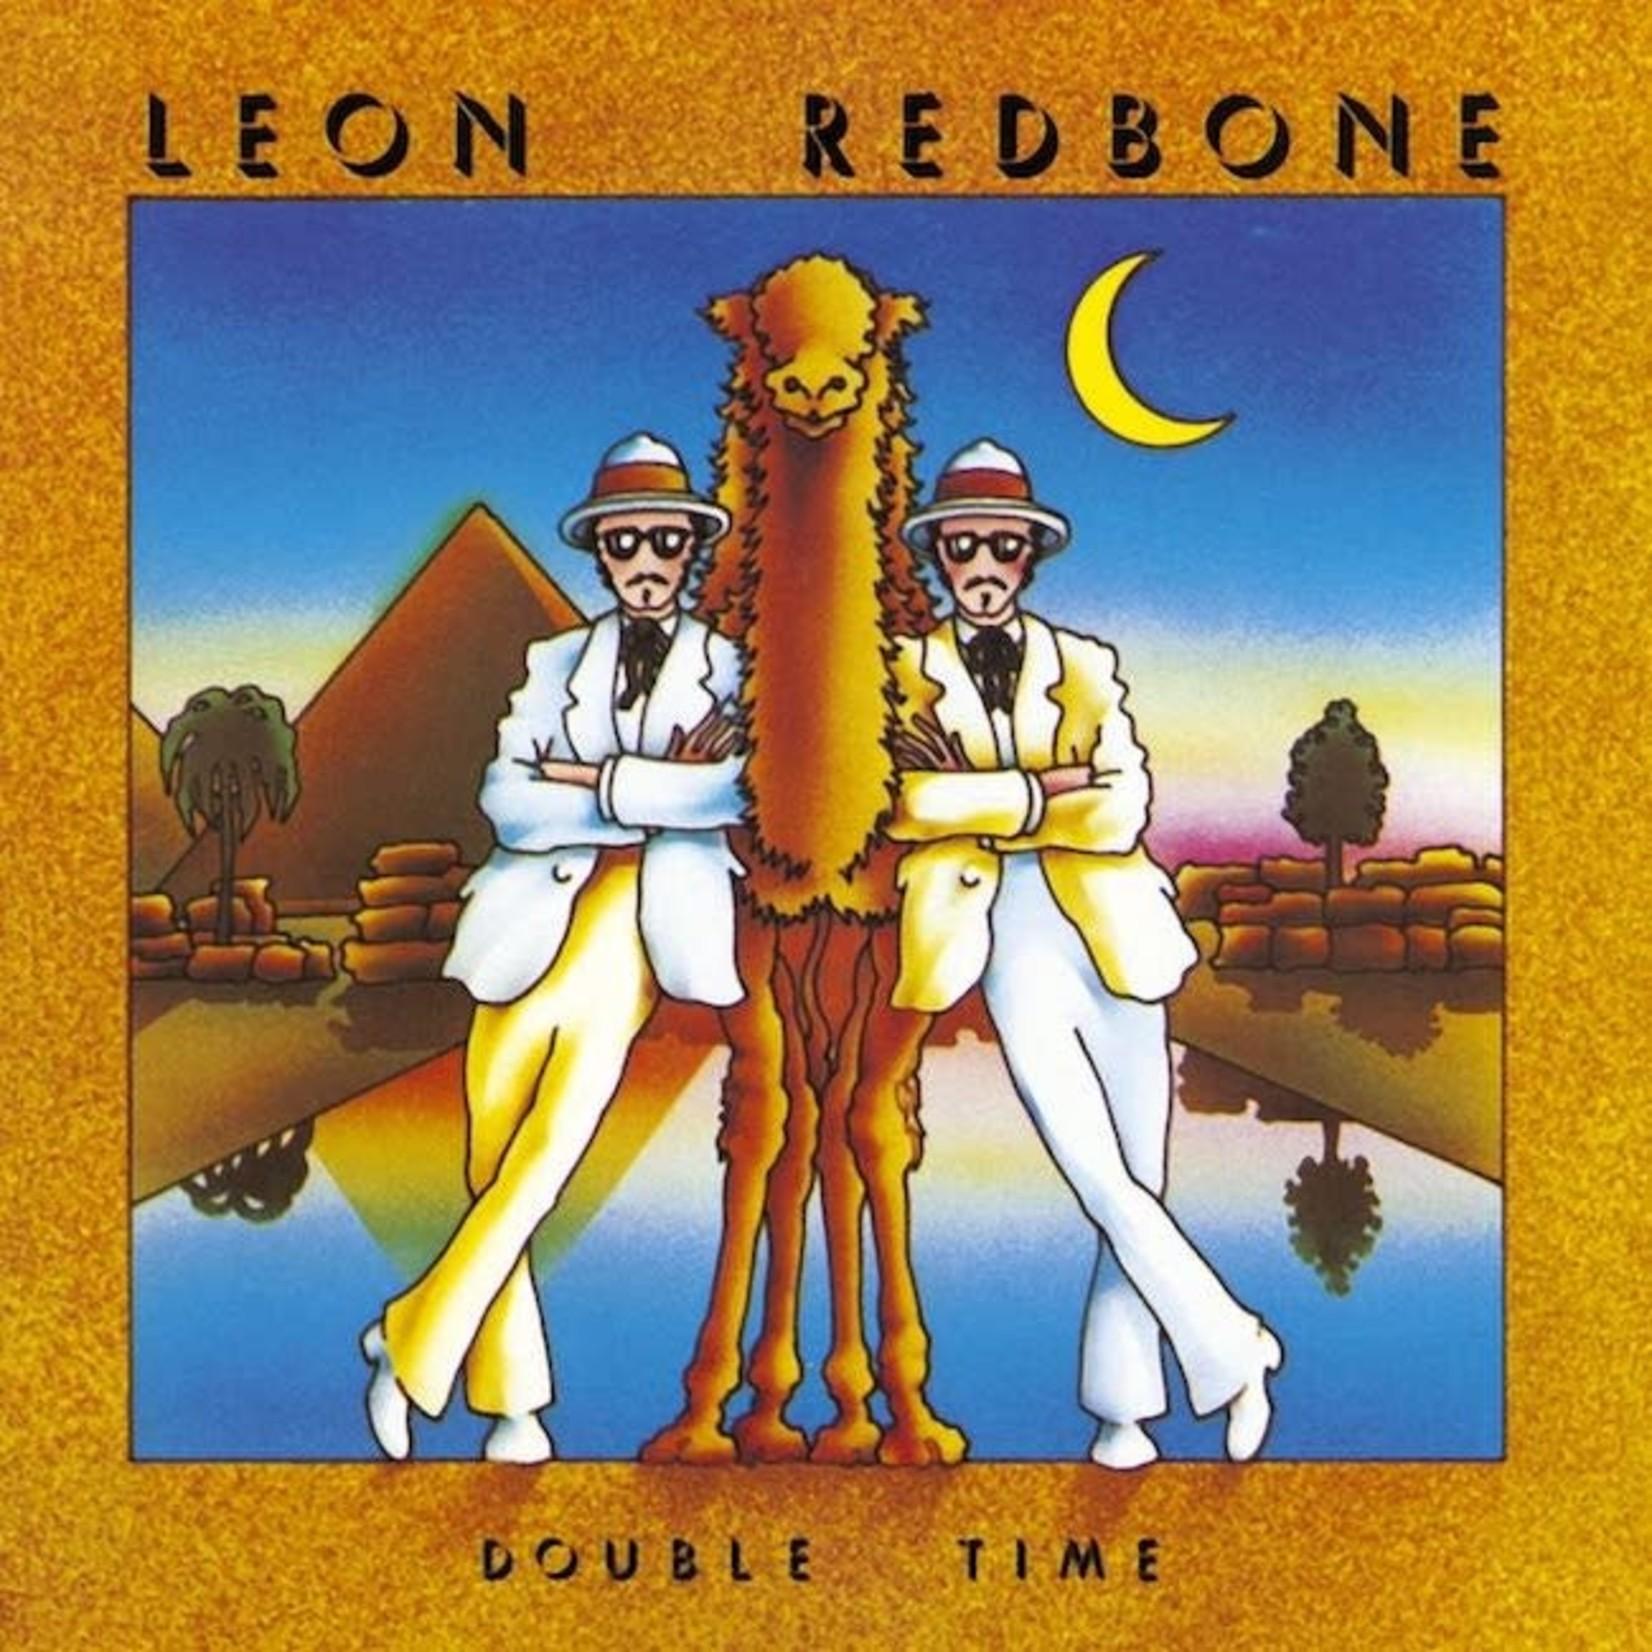 [Vintage] Redbone, Leon: Double Time